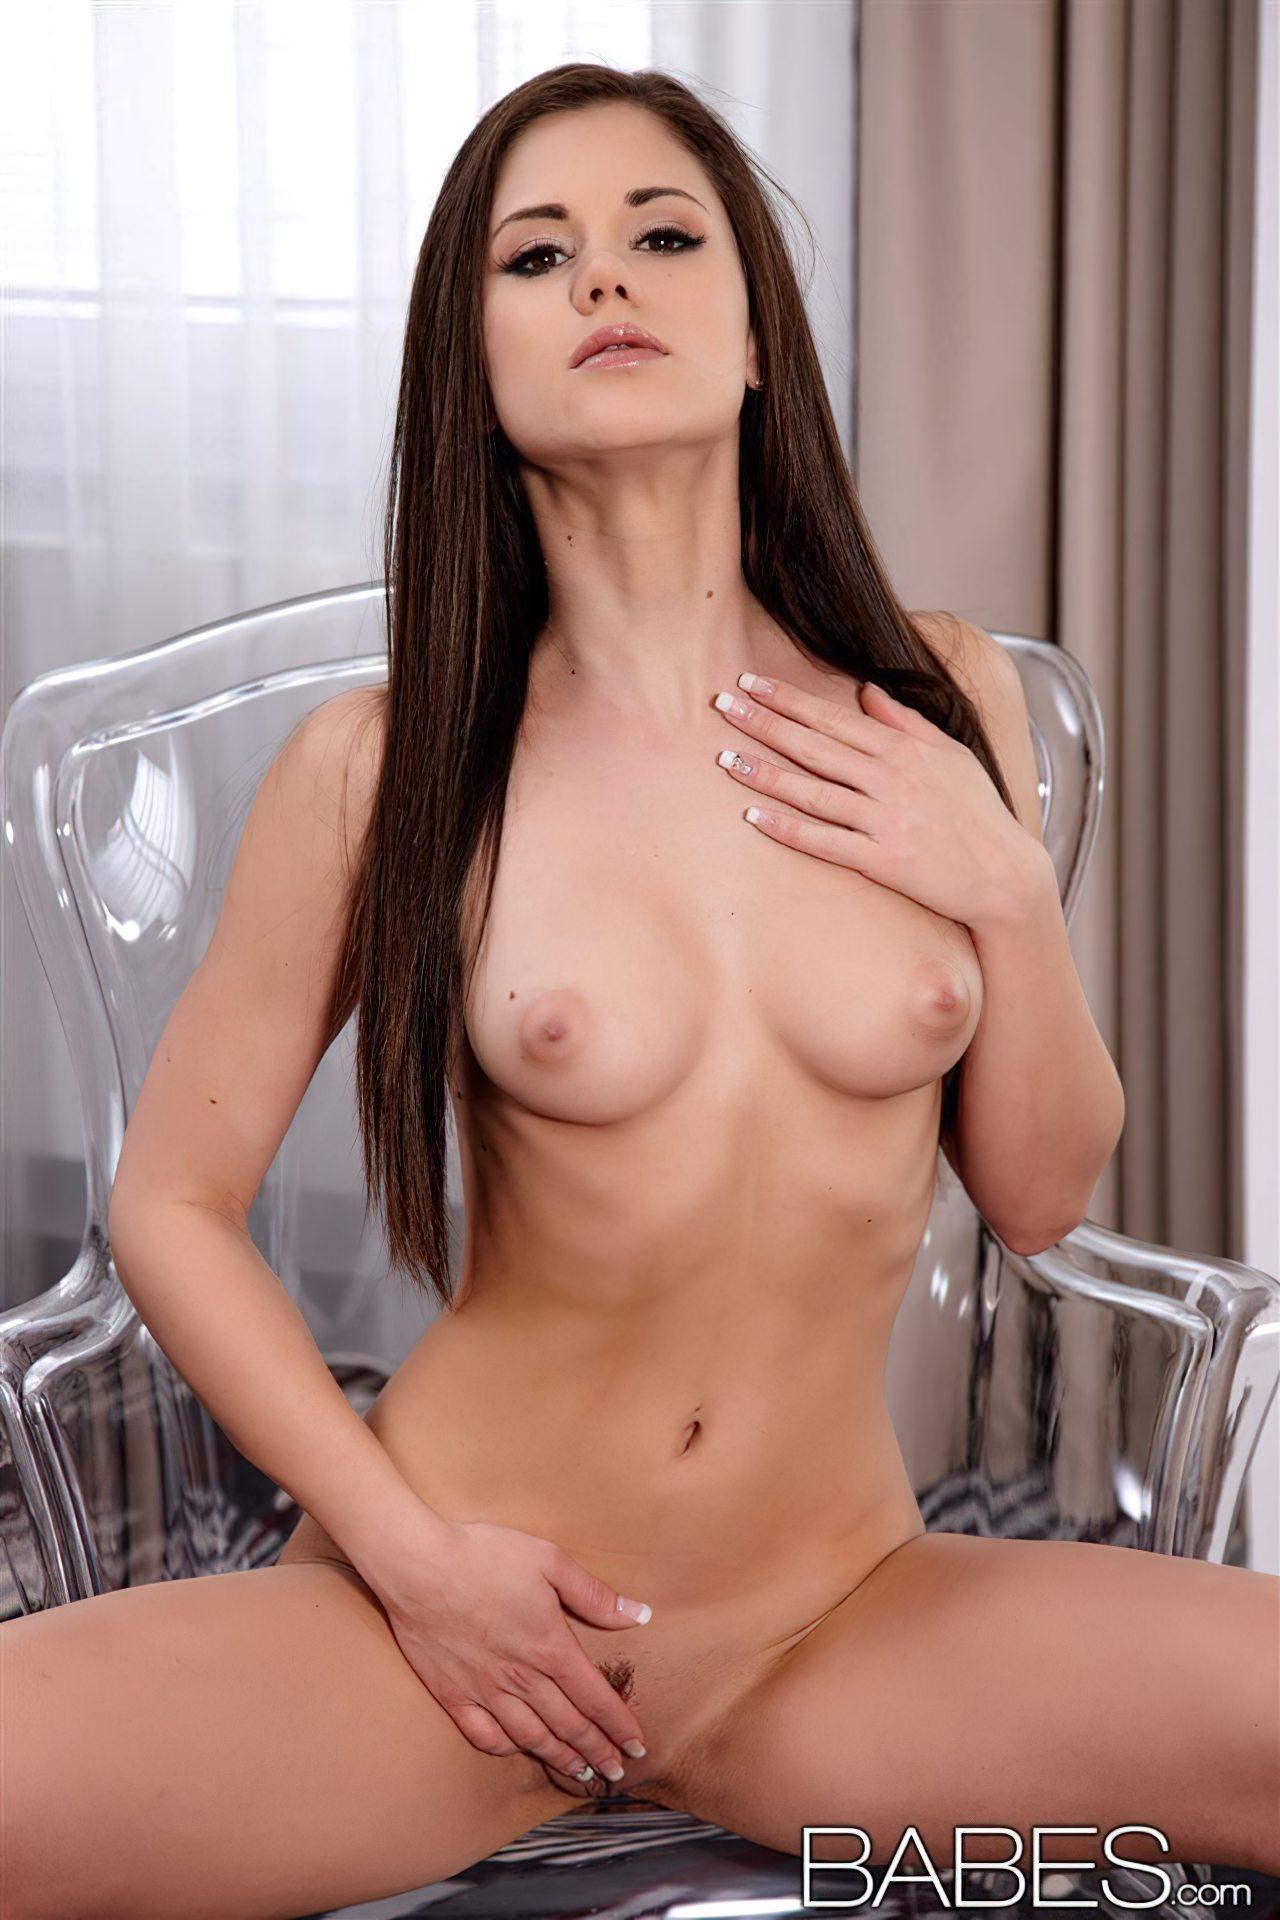 Fotos Mulheres Despidas (33)